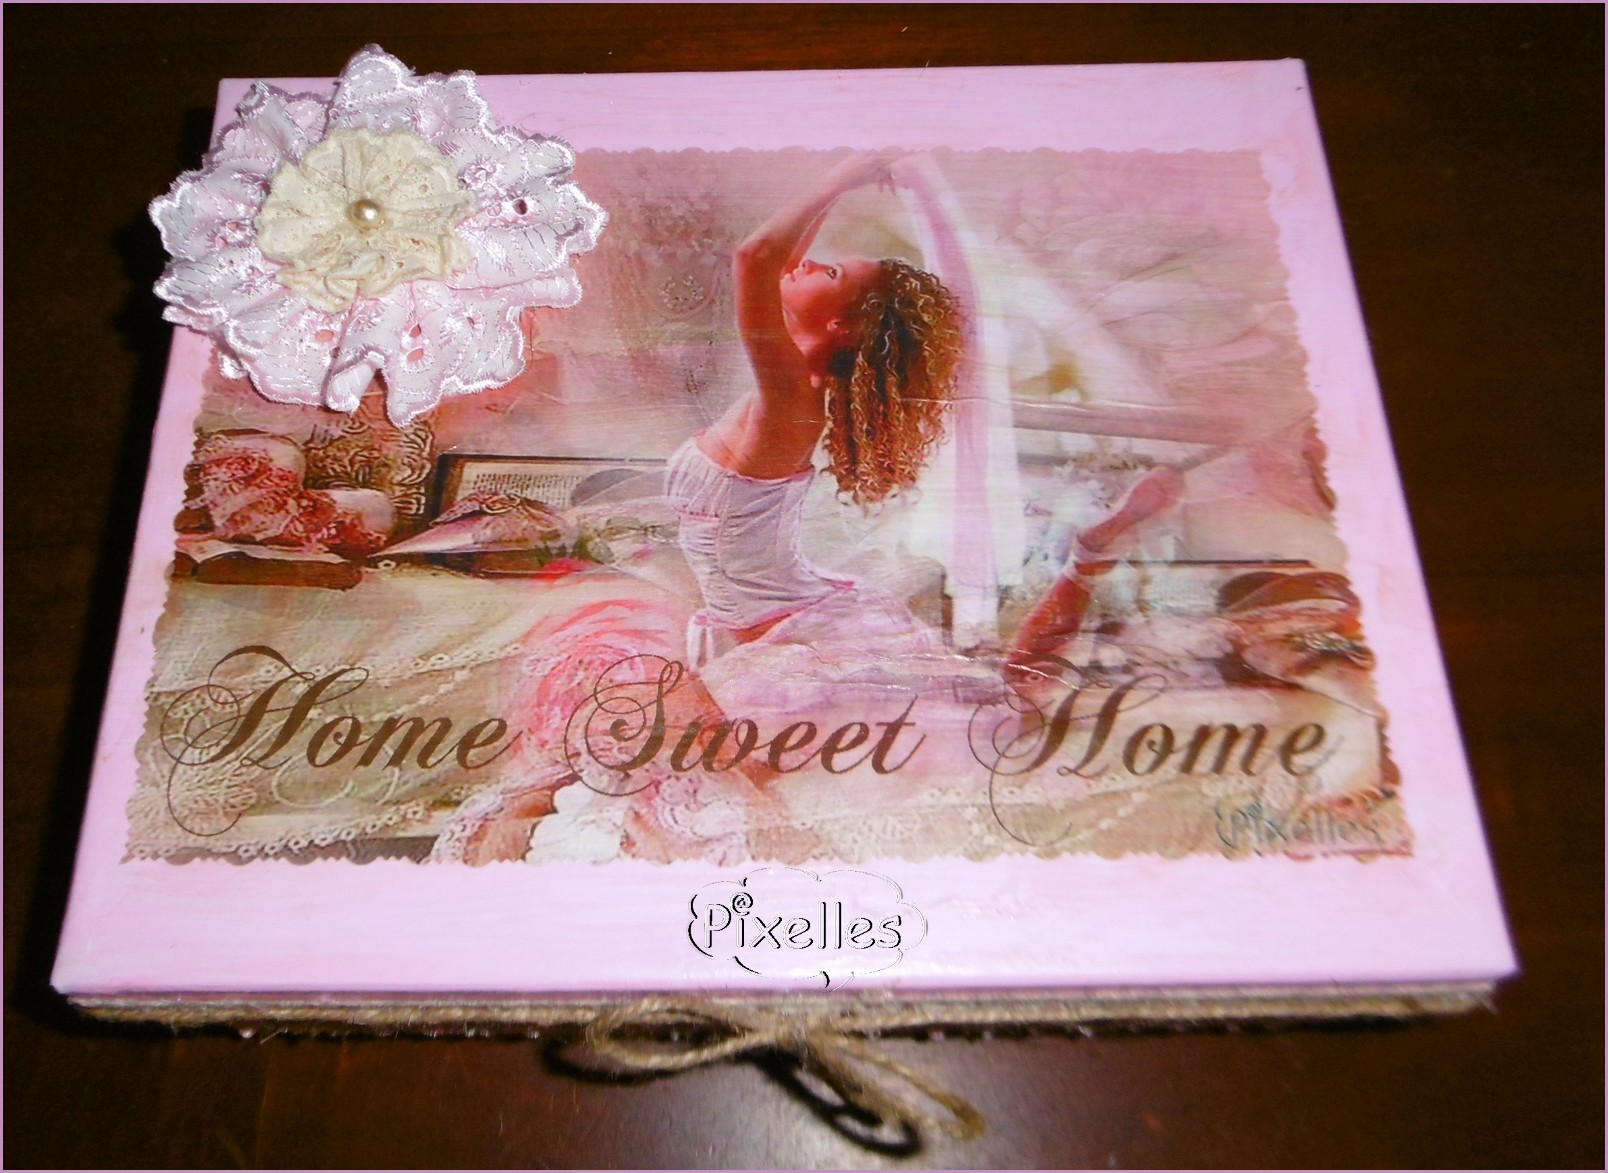 boîte rose danseuse home sweet home.jpg